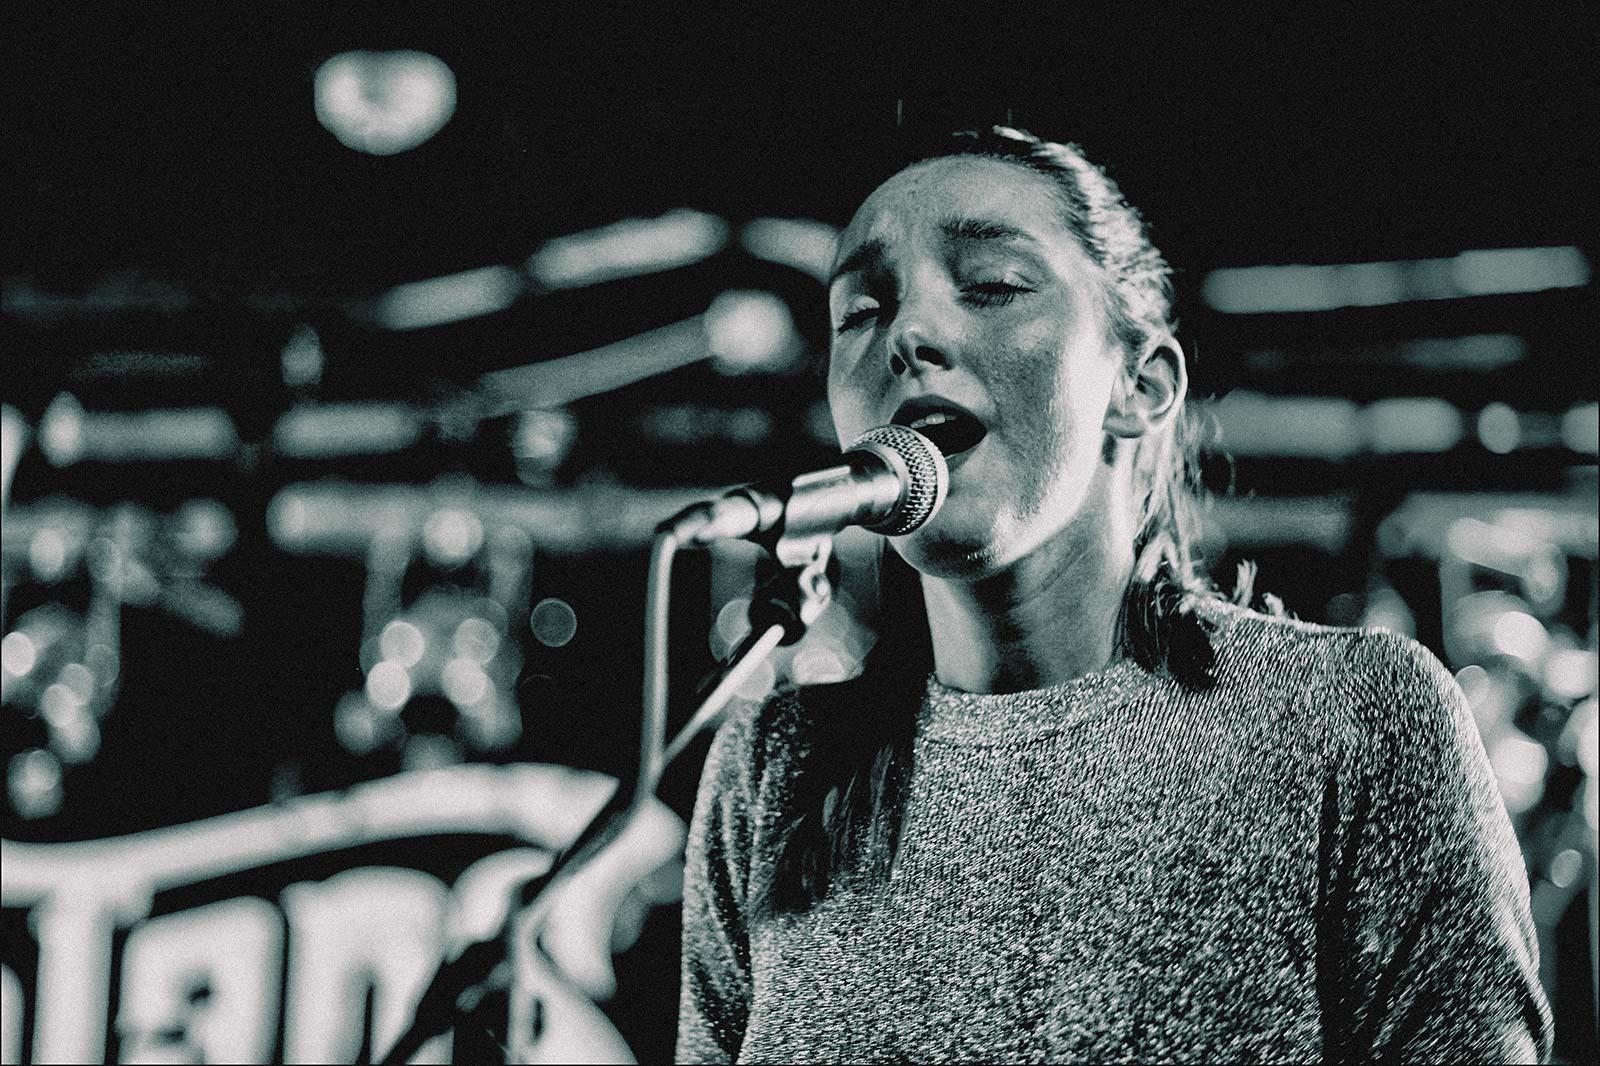 come_on_live_long_album_launch_whelans_dublin001.jpg